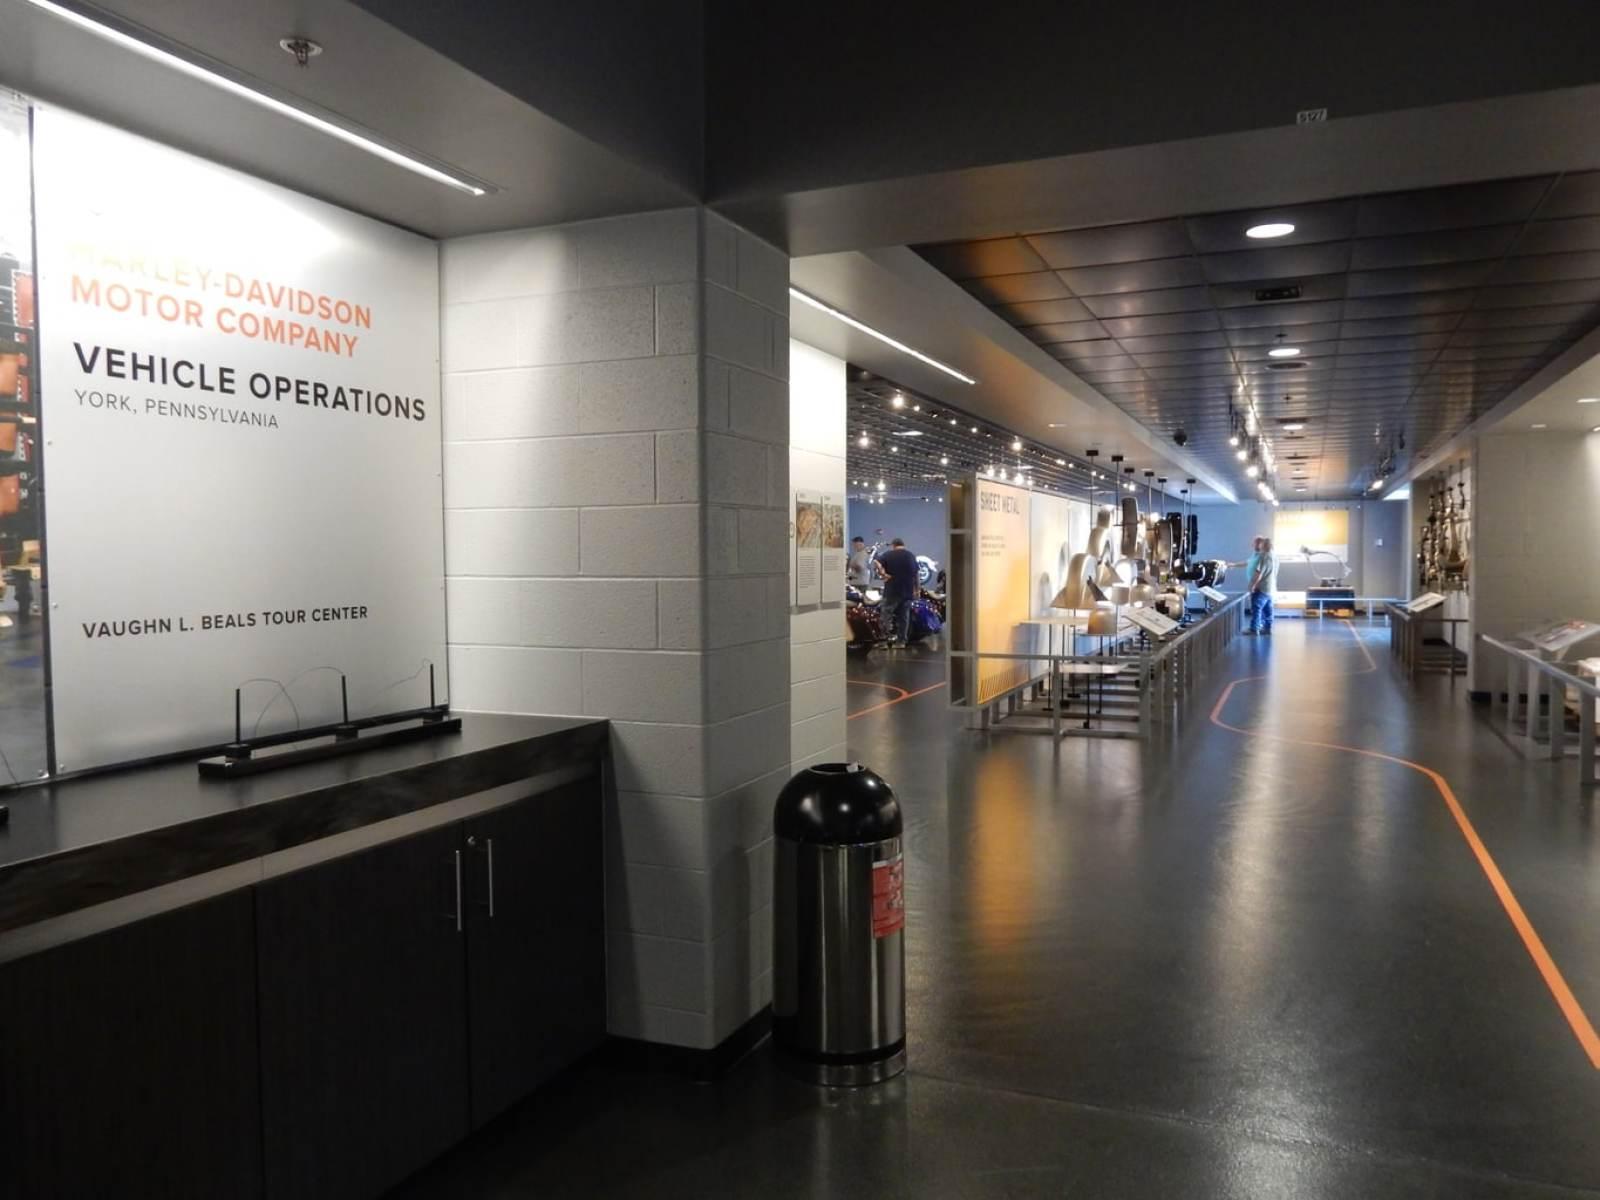 Harley Davidson Vehicle Operations York PA